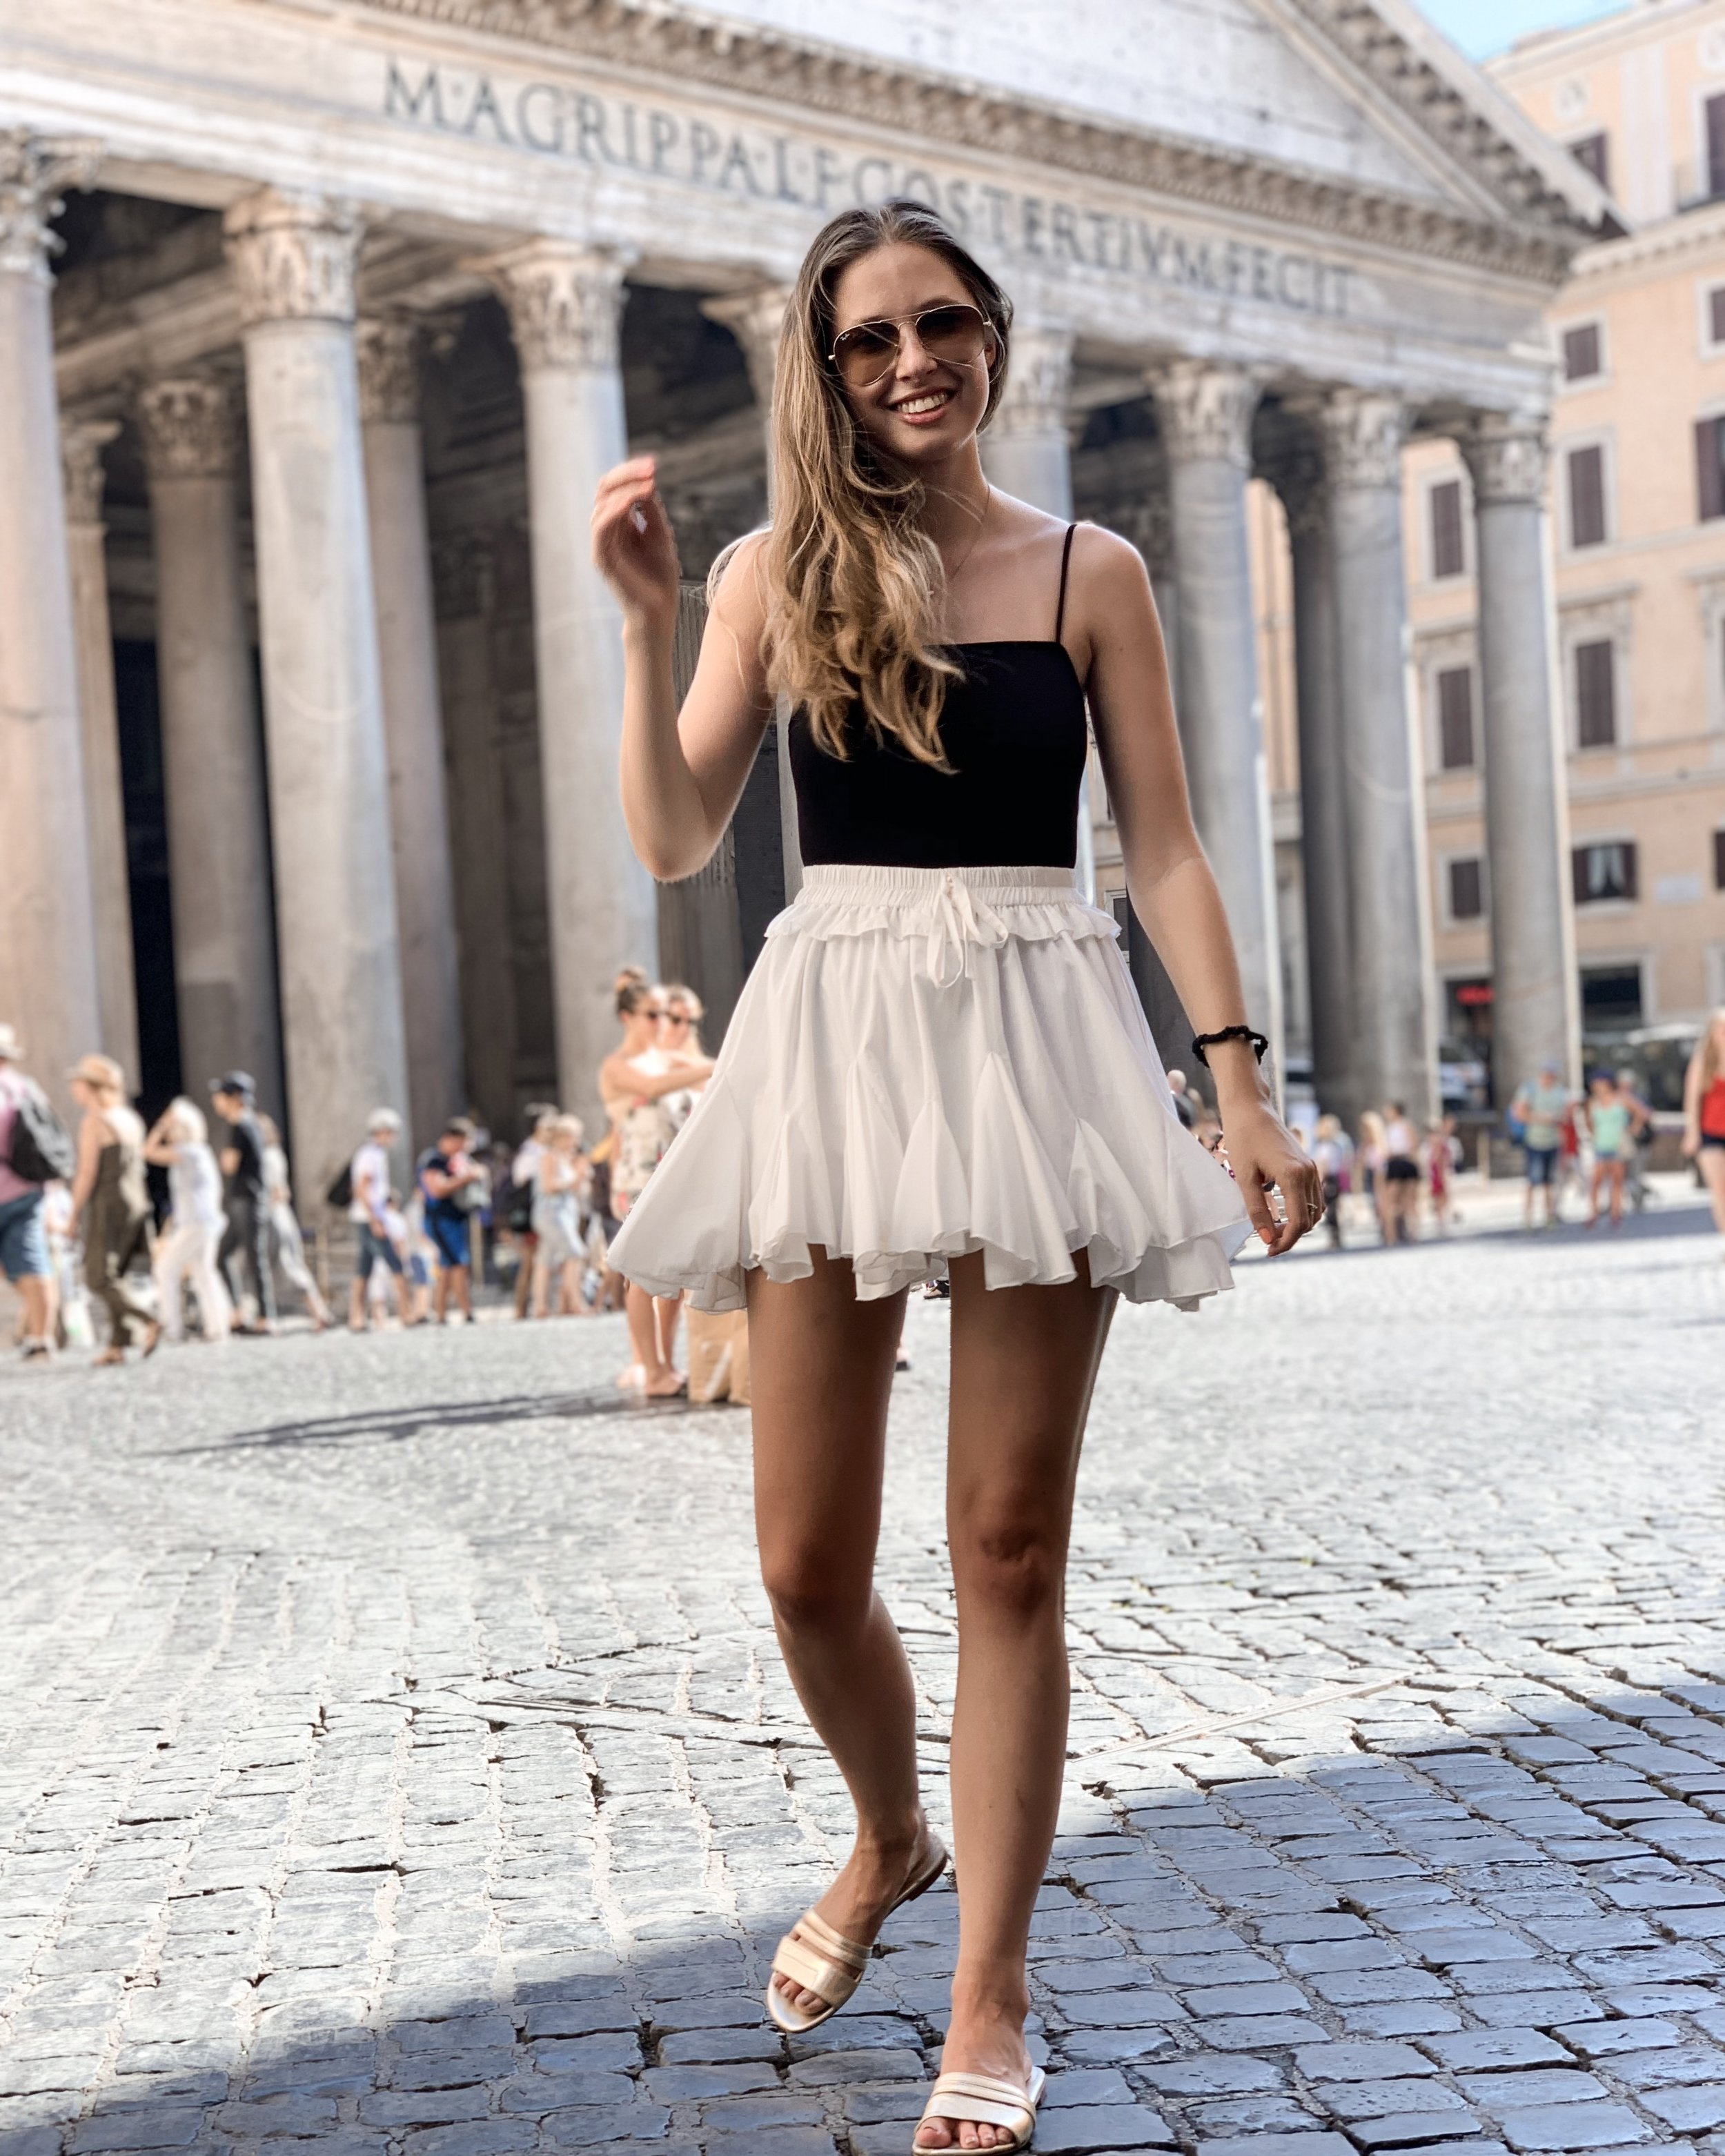 Rome Italy photography, Rome travel guide, Rome travel diary, travel Italy photography, pantheon, colloseum, trevi fountain, da enzo